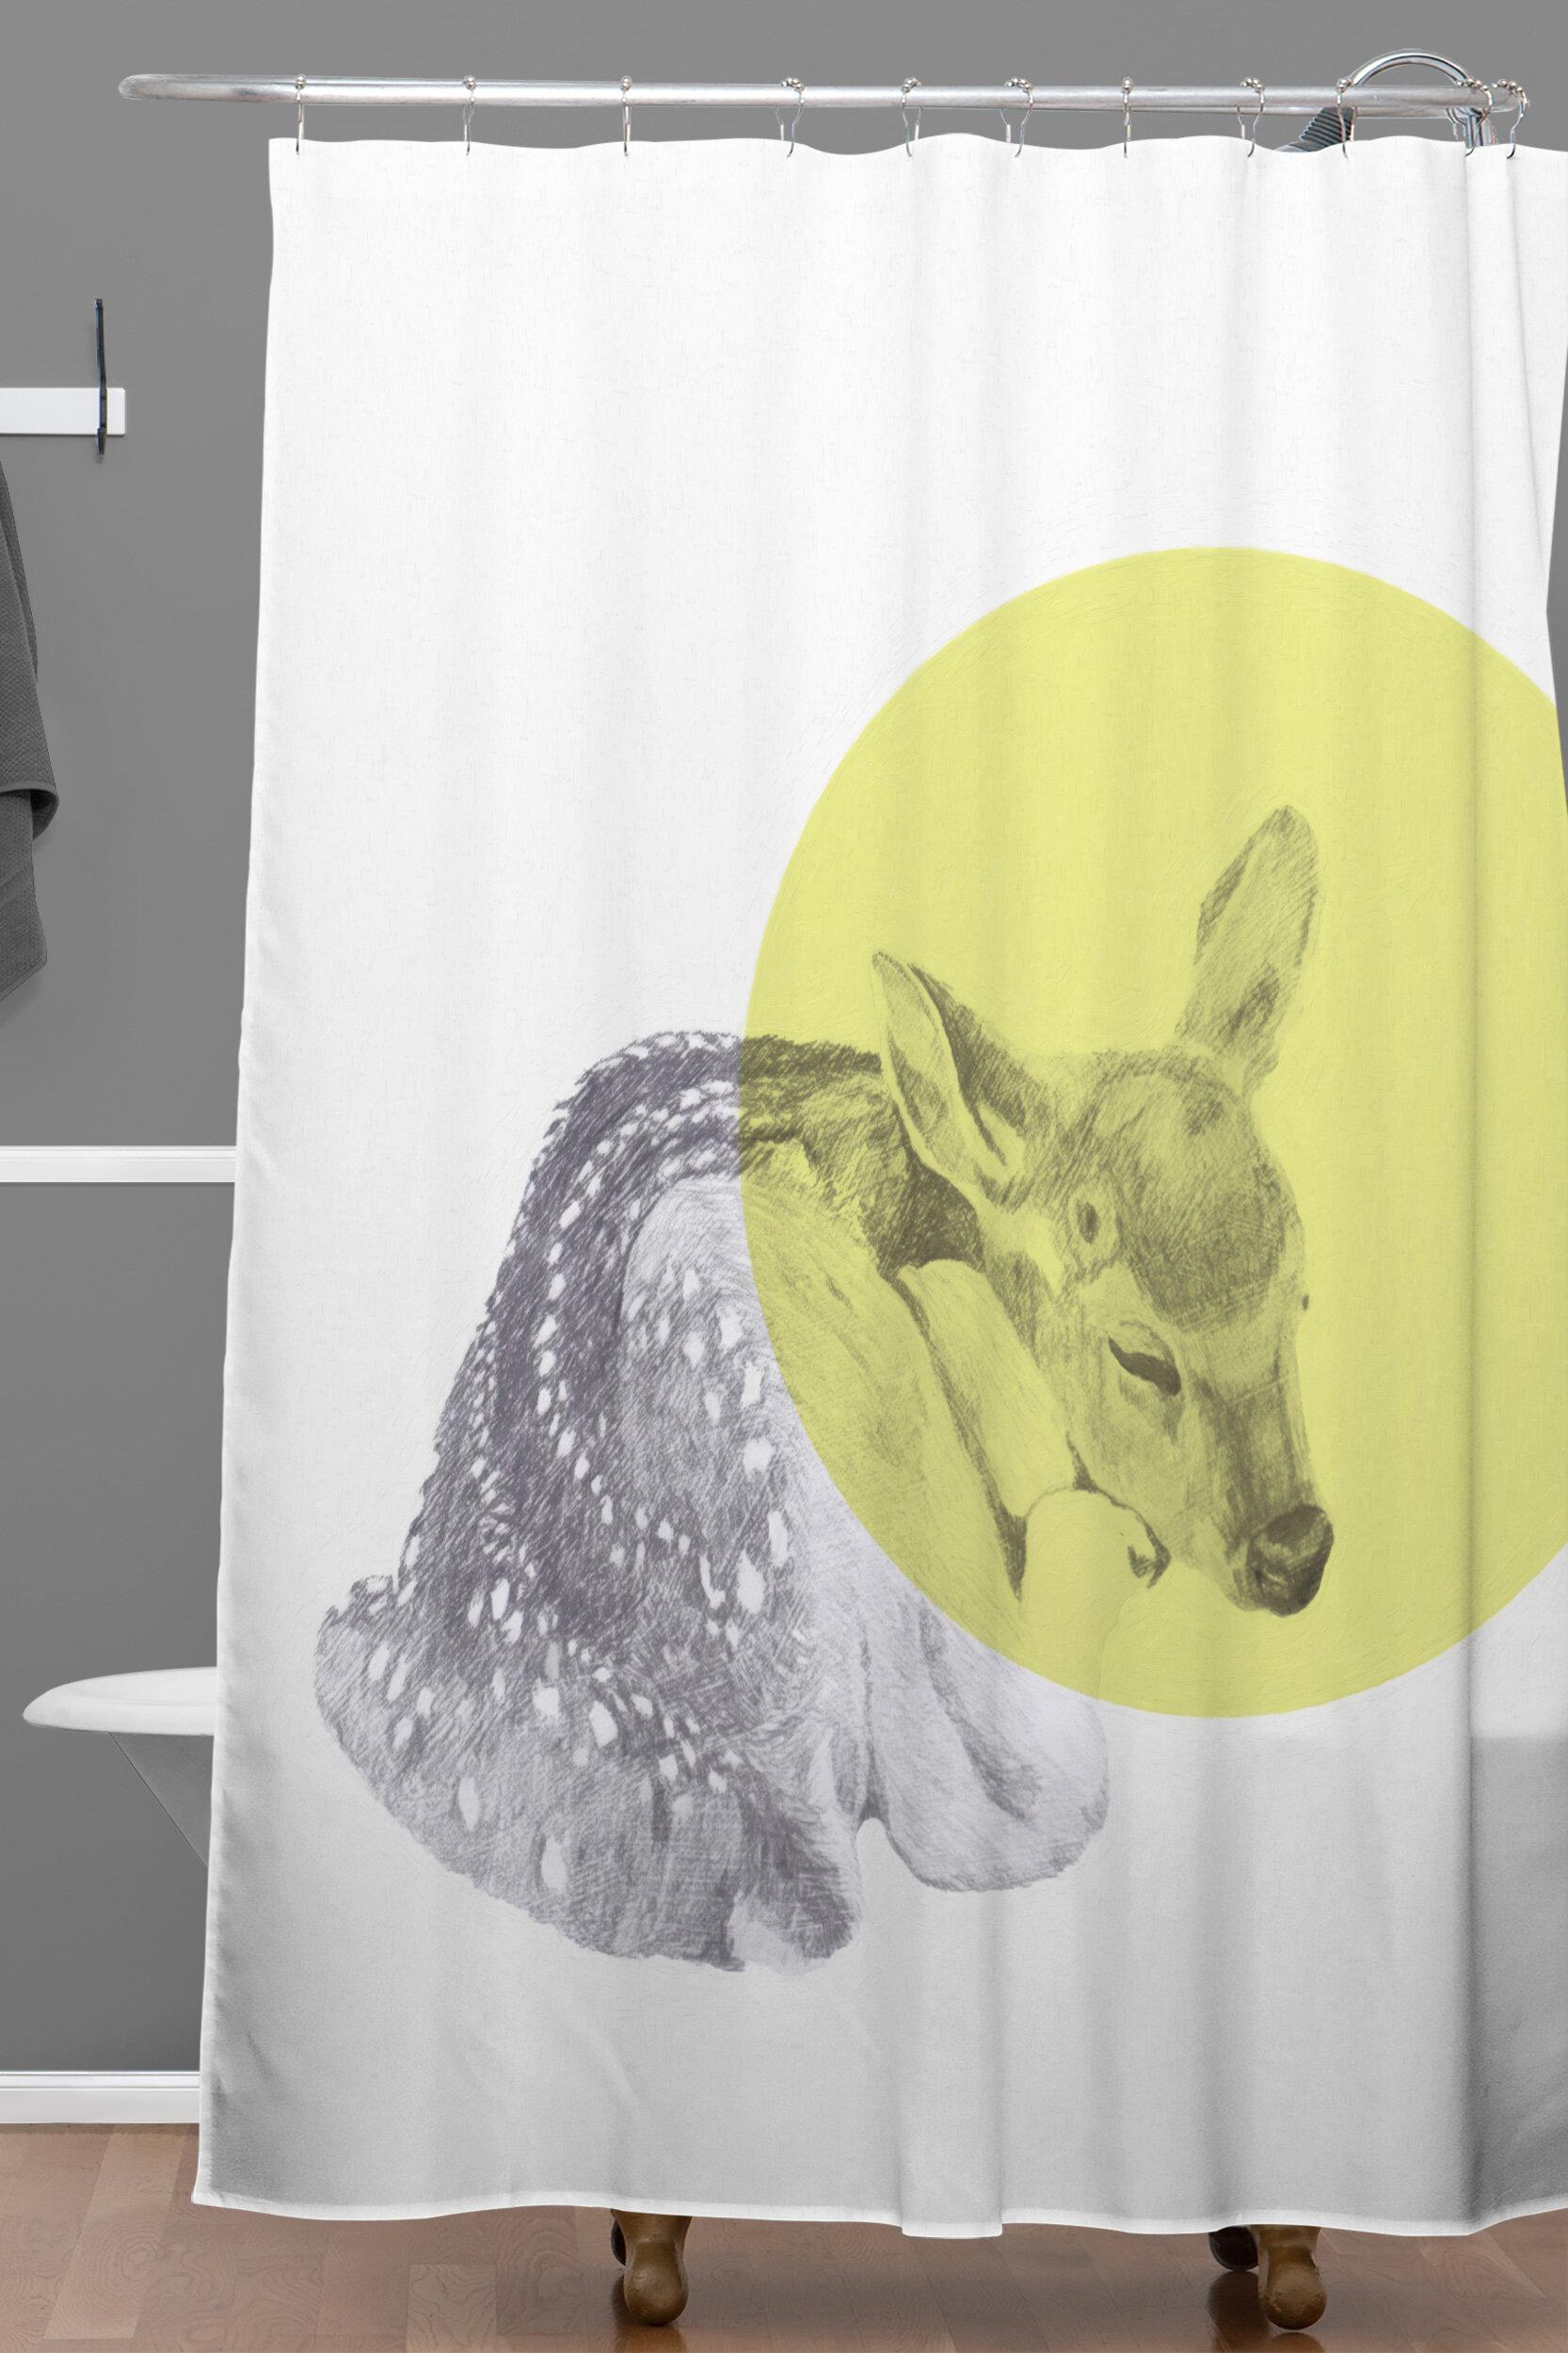 East Urban Home Morgan Kendall Sleeping Deer Shower Curtain